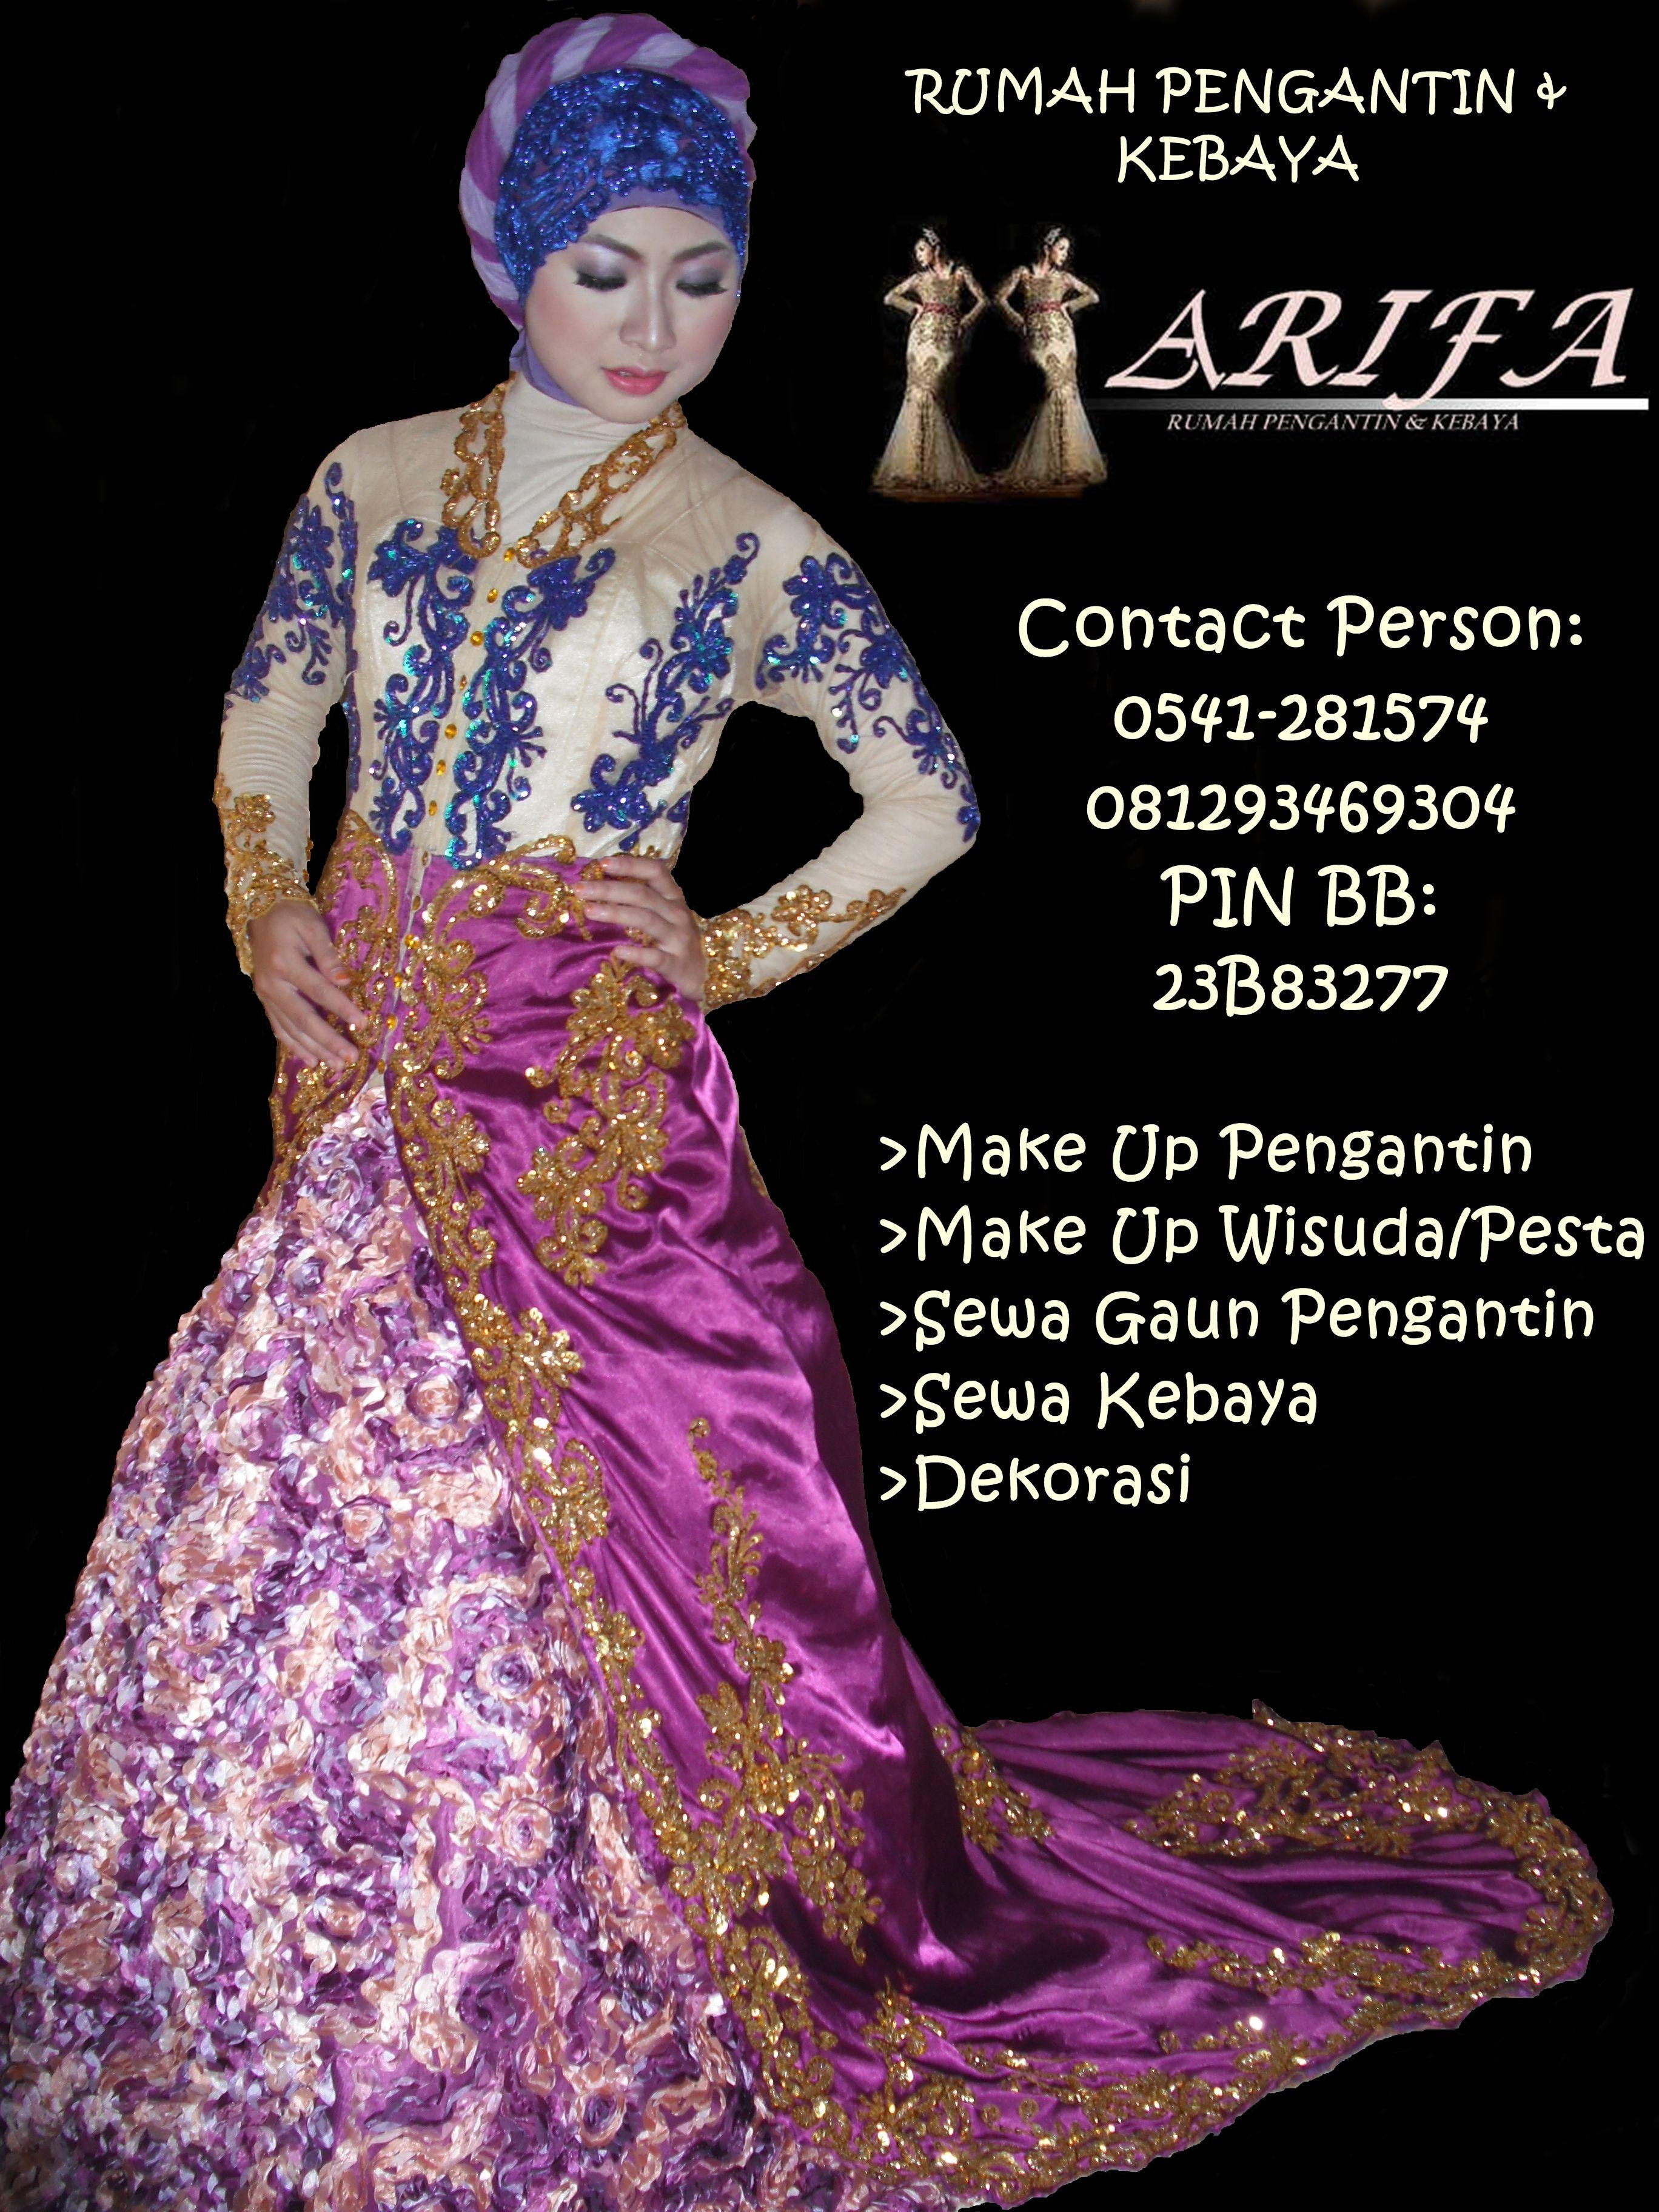 Rumah Pengantin & Kebaya ARIFA Wedding Pinterest